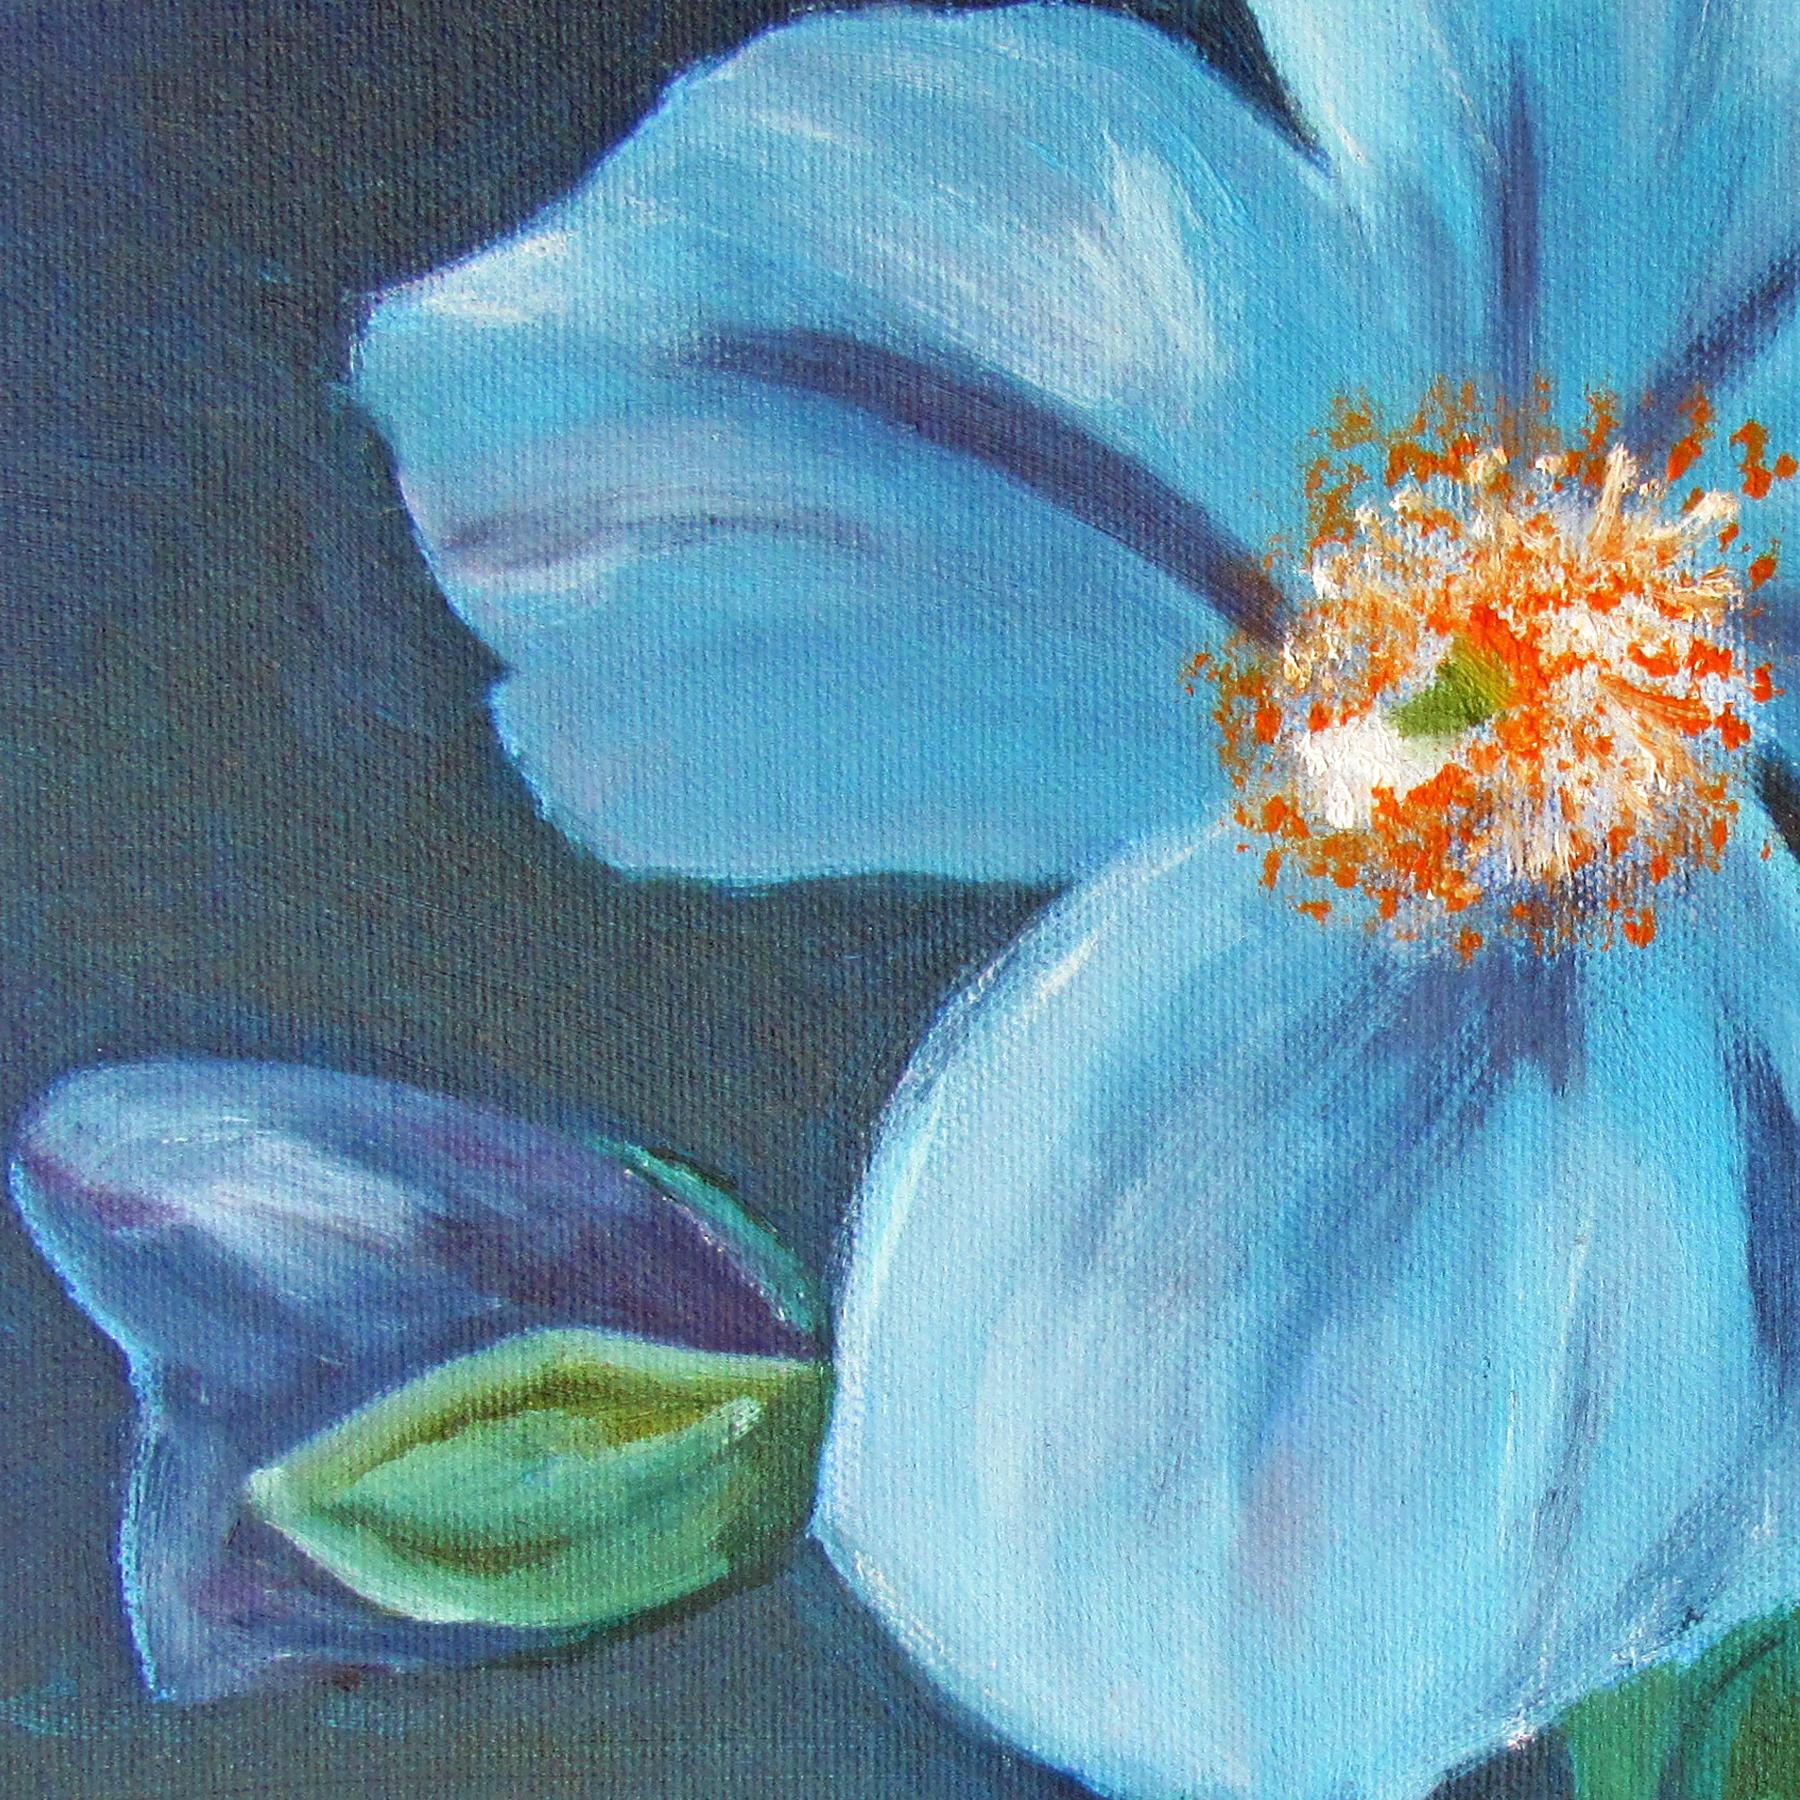 Blue Poppy closeup 6x6 card.jpg